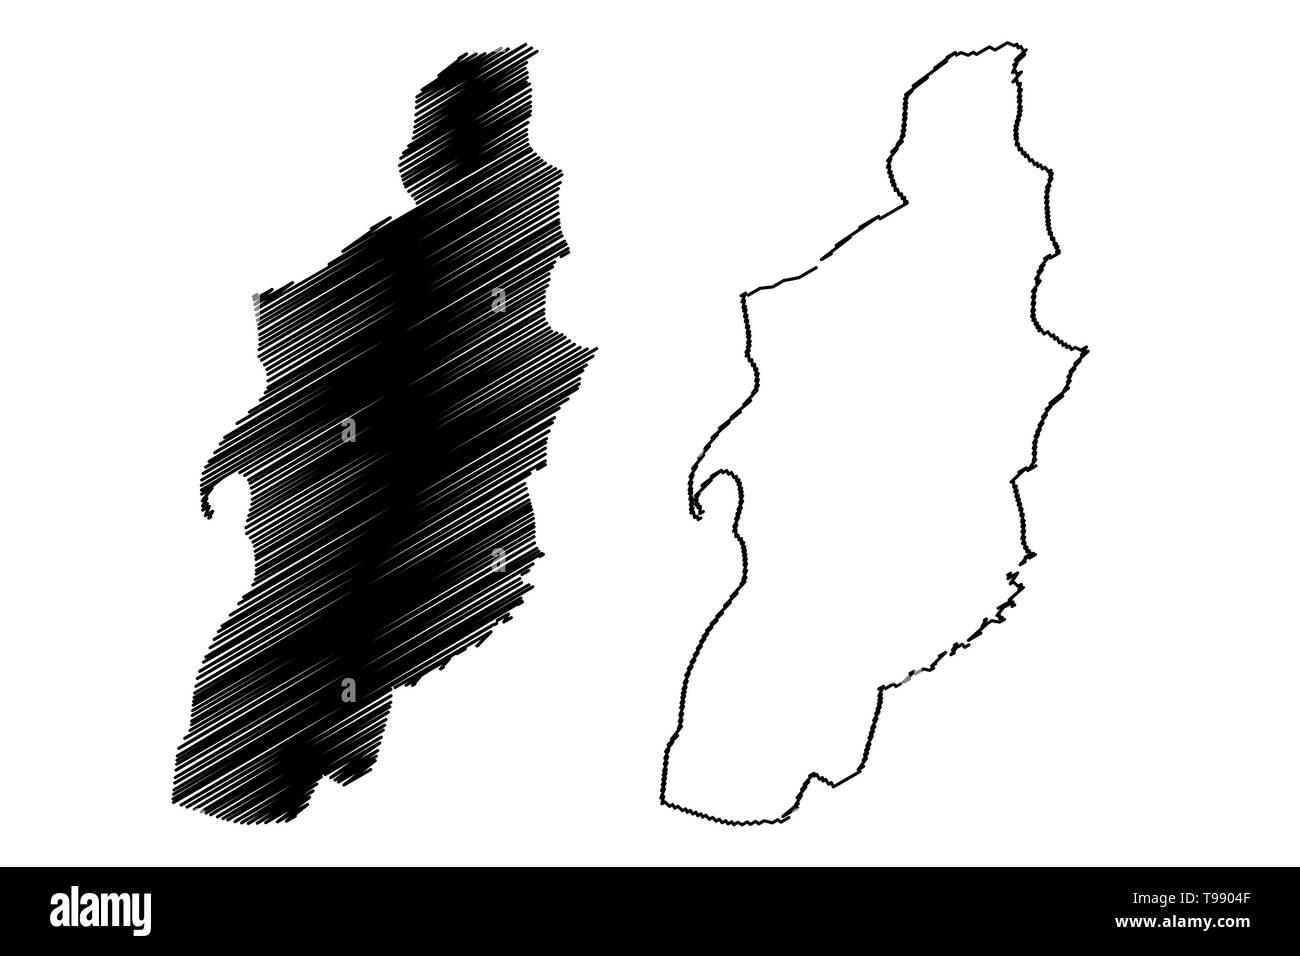 Tebessa Province (Provinces of Algeria, Peoples Democratic Republic of Algeria) map vector illustration, scribble sketch Tebessa map - Stock Image